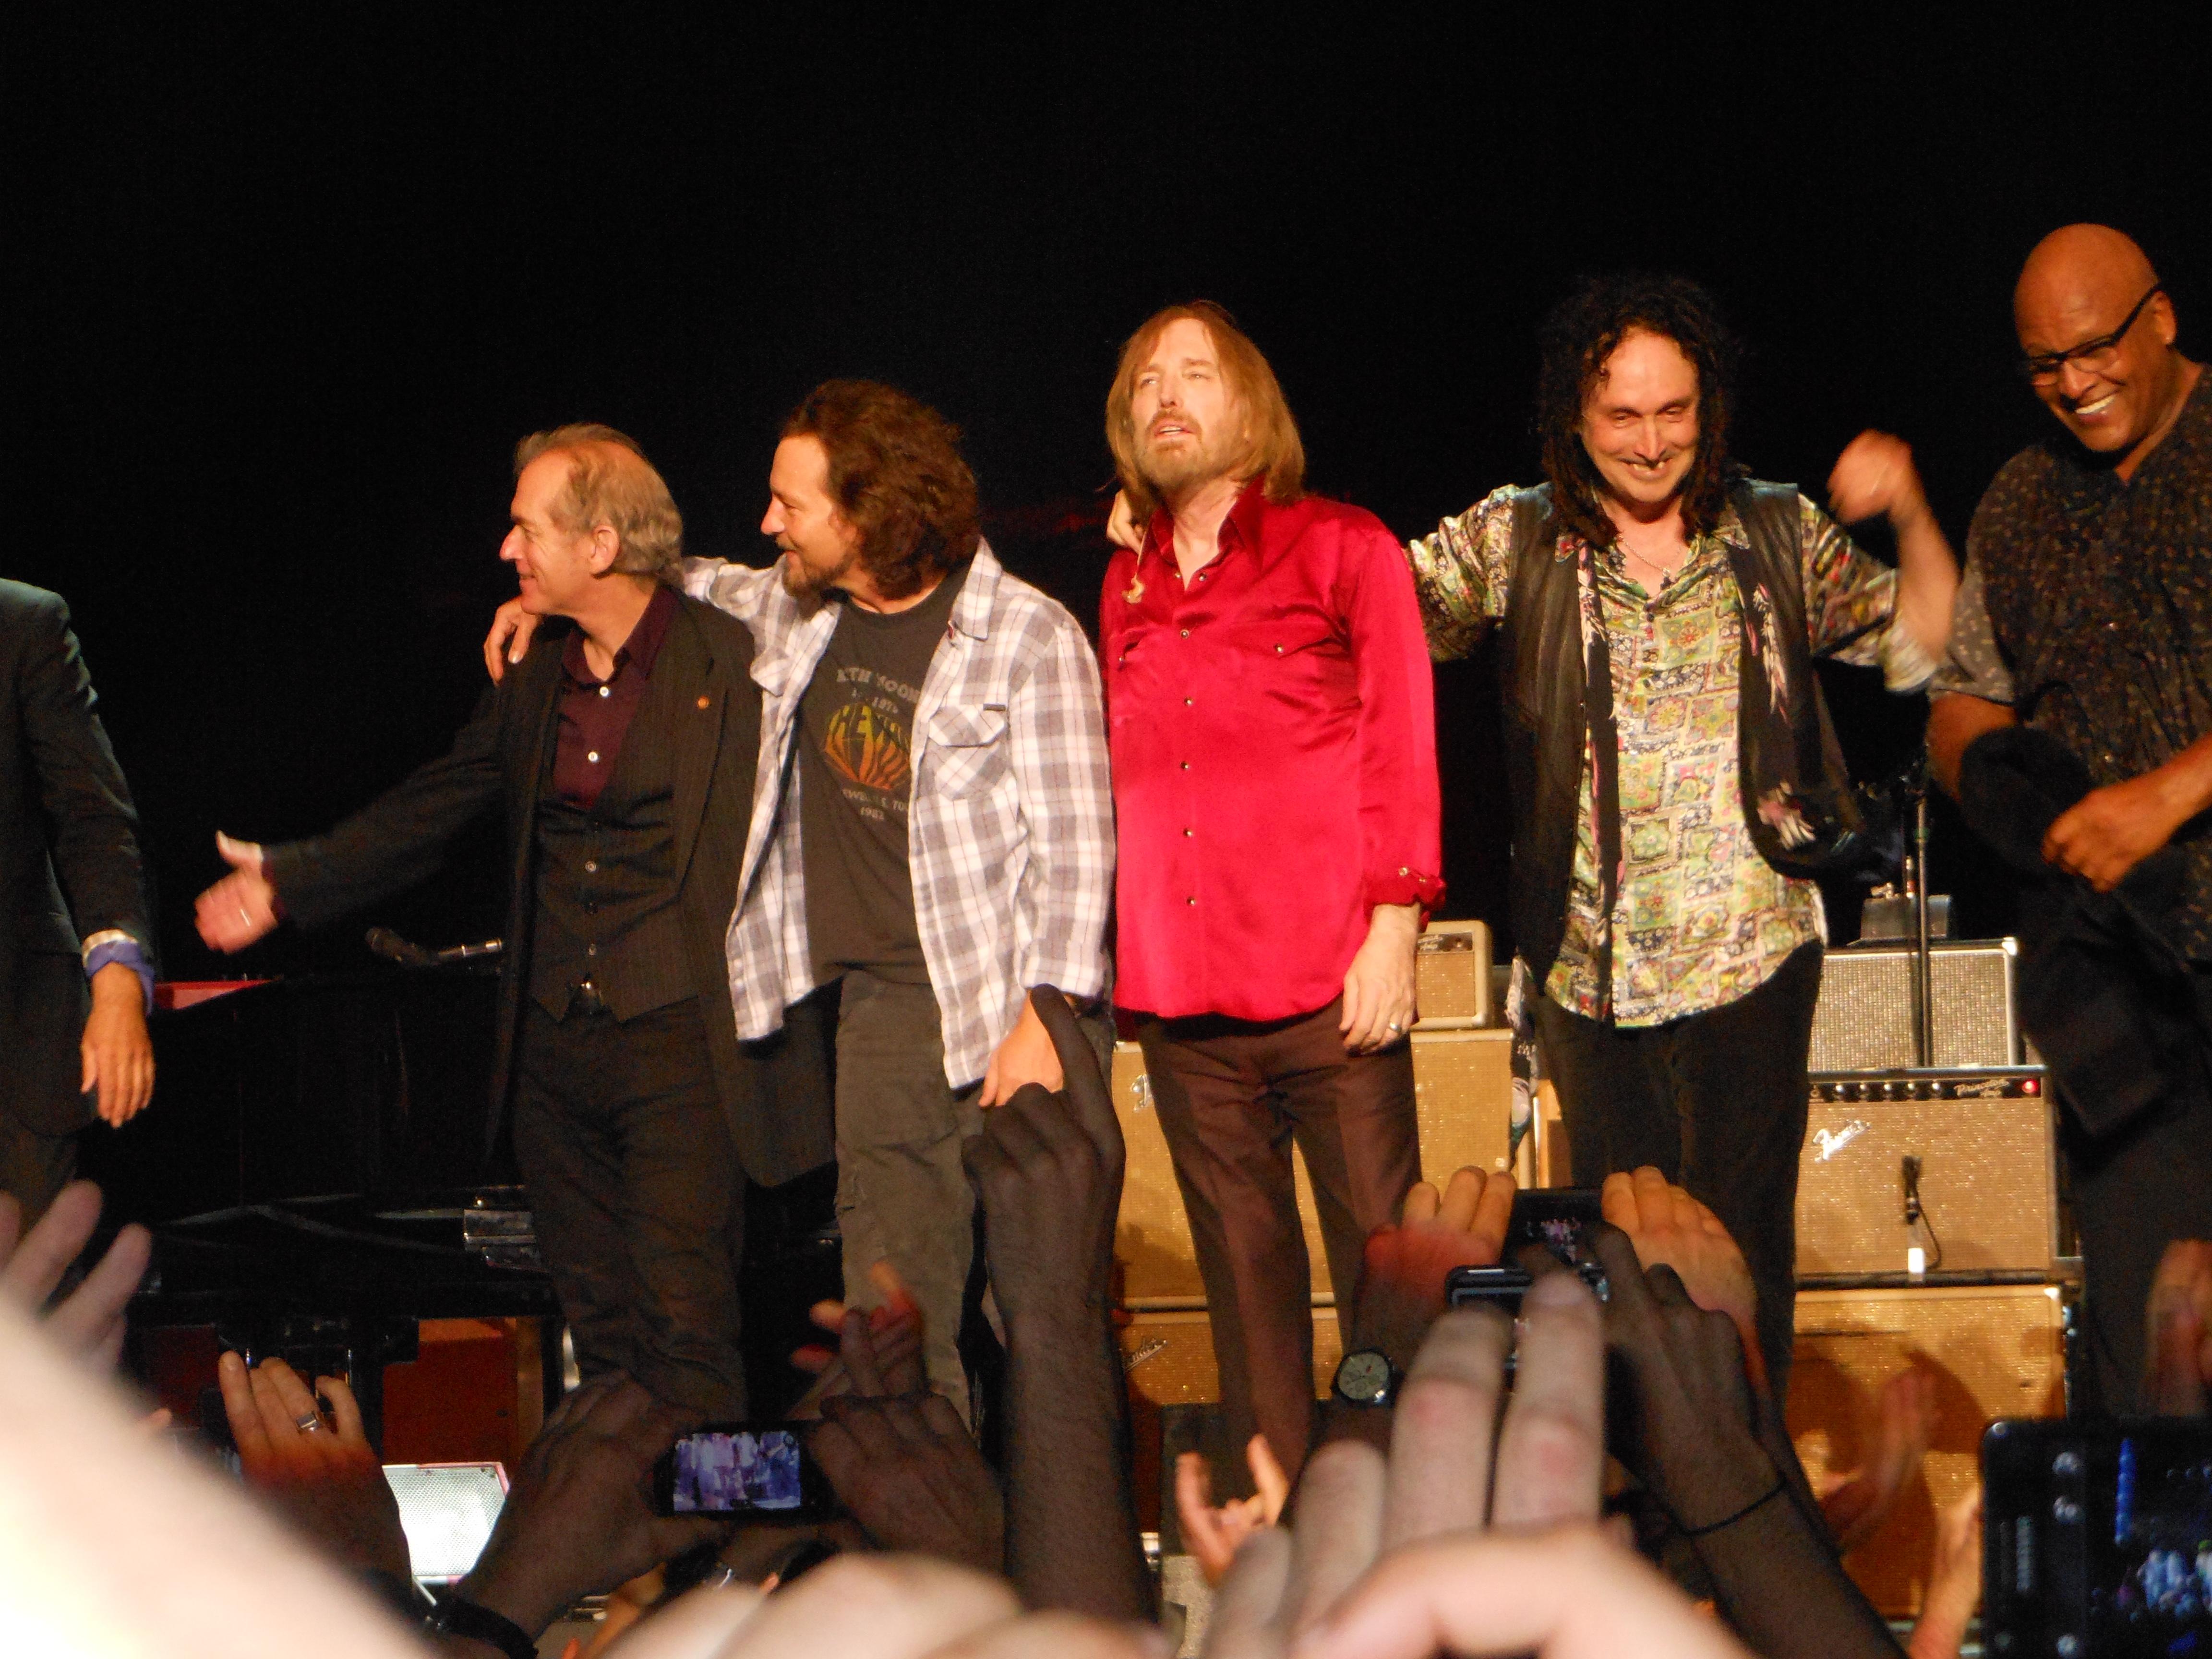 Concertreview: Eindelijk Tom Petty